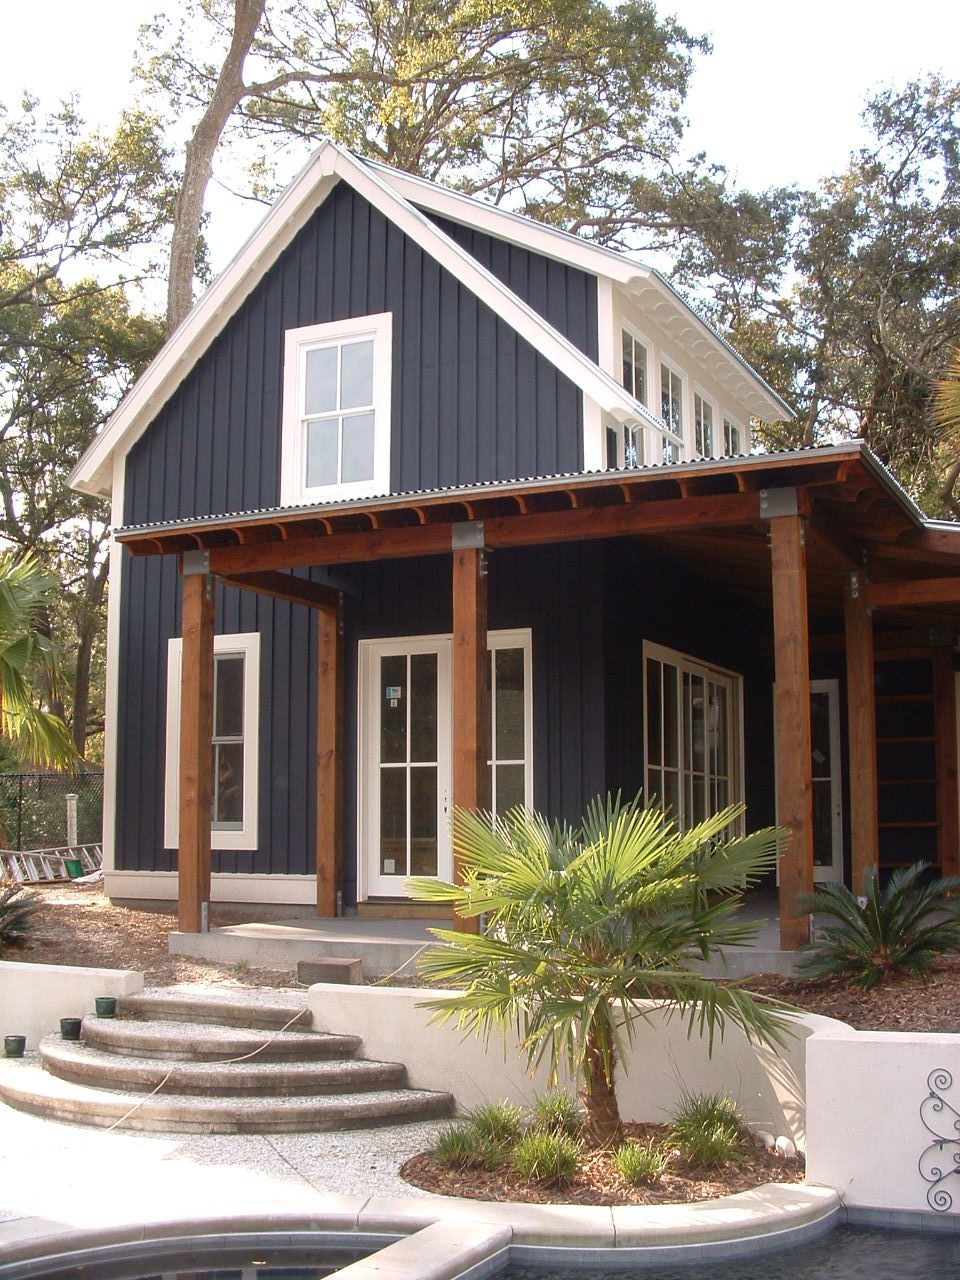 Pool Side Hideout House Plan C0573 Design Allison